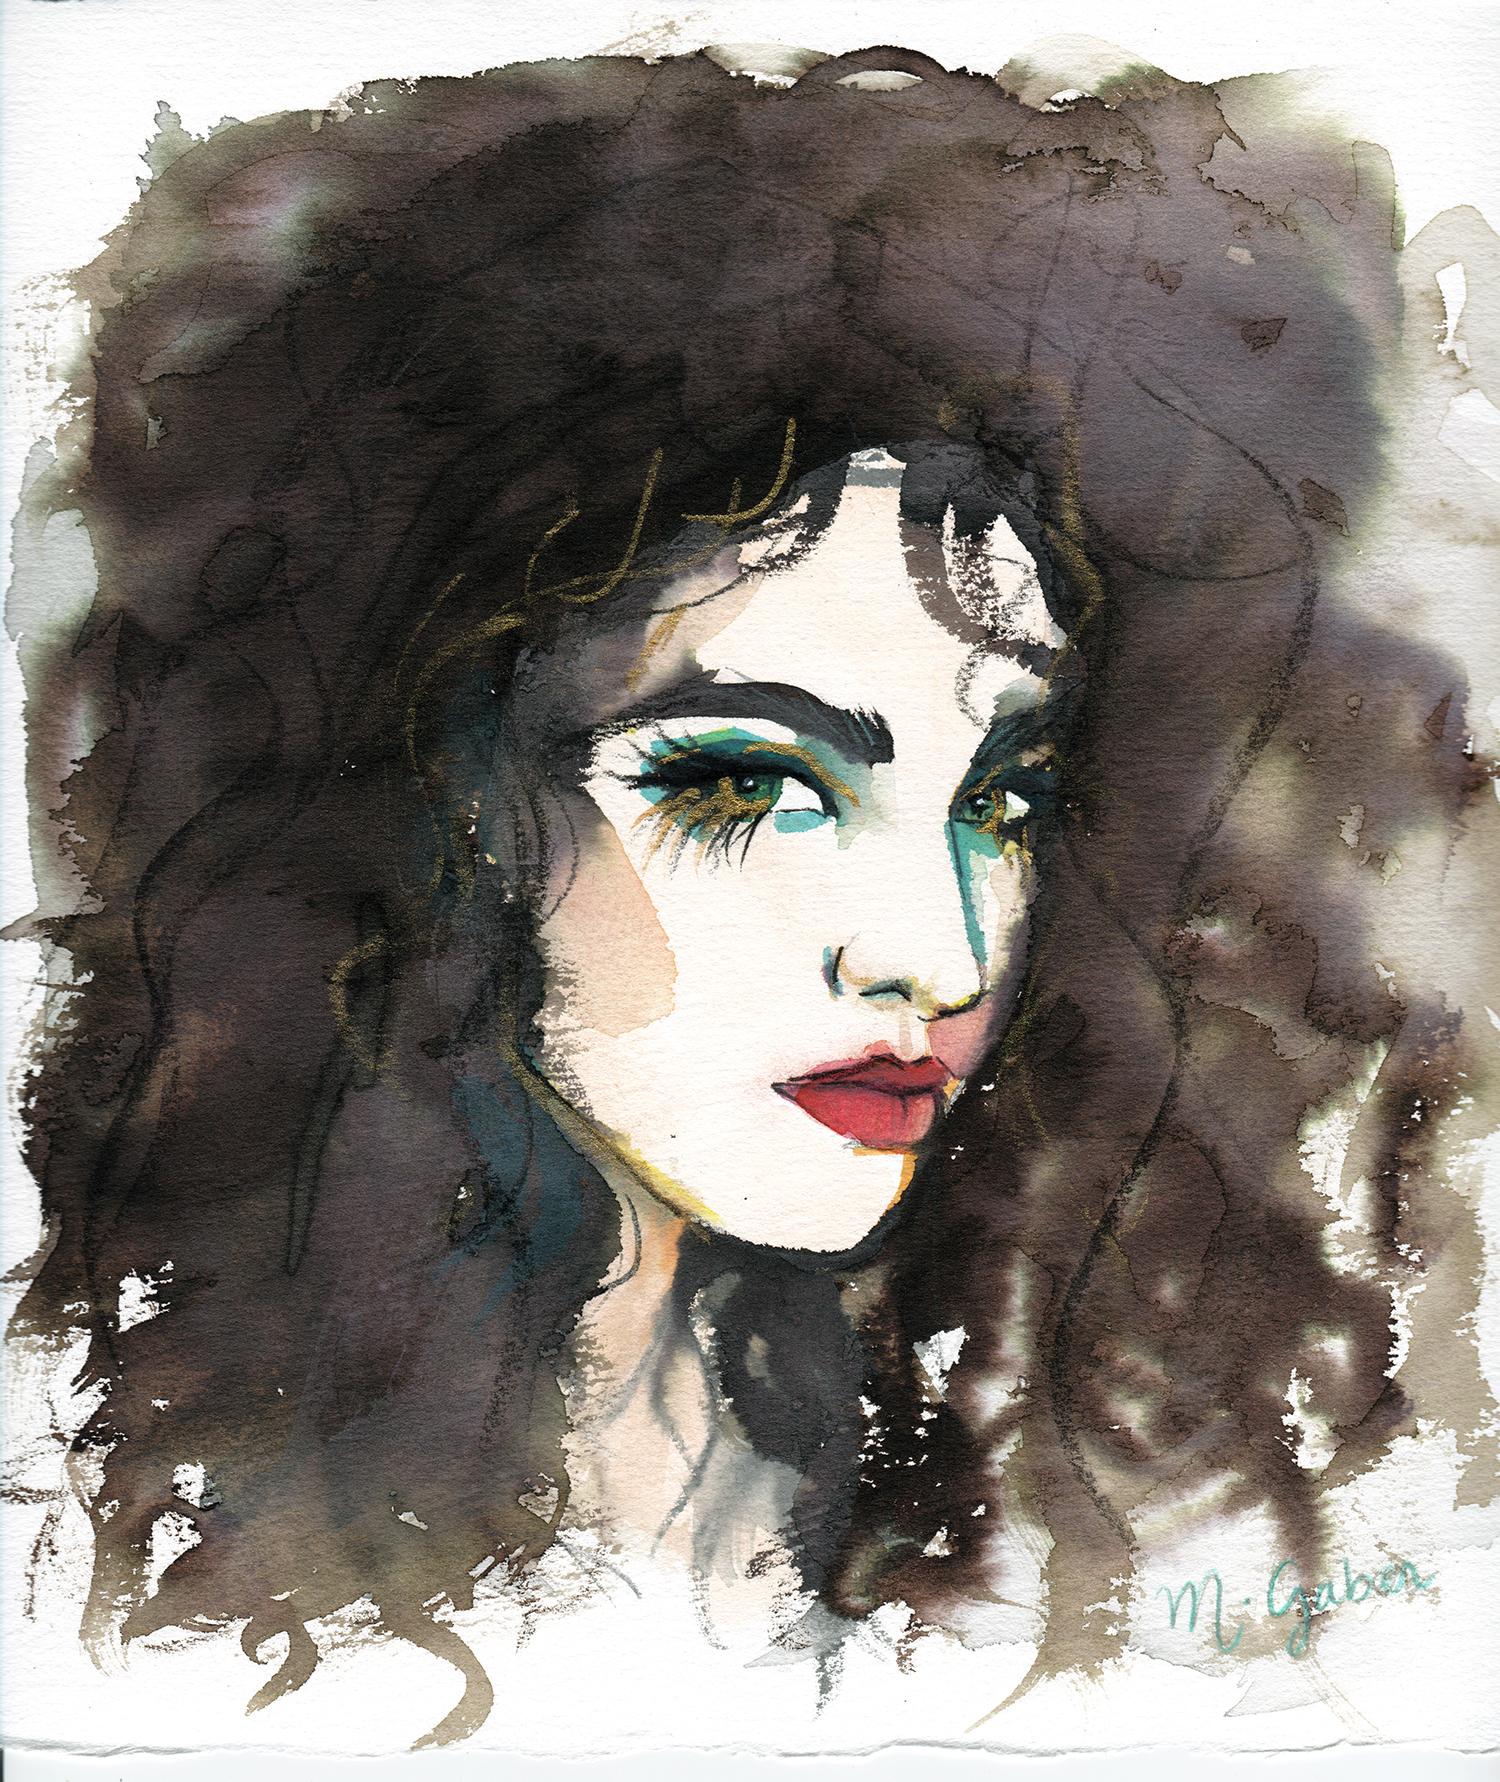 Maryam Gaber-Portrait-Watercolor-Queen-2016 2-1500.jpg